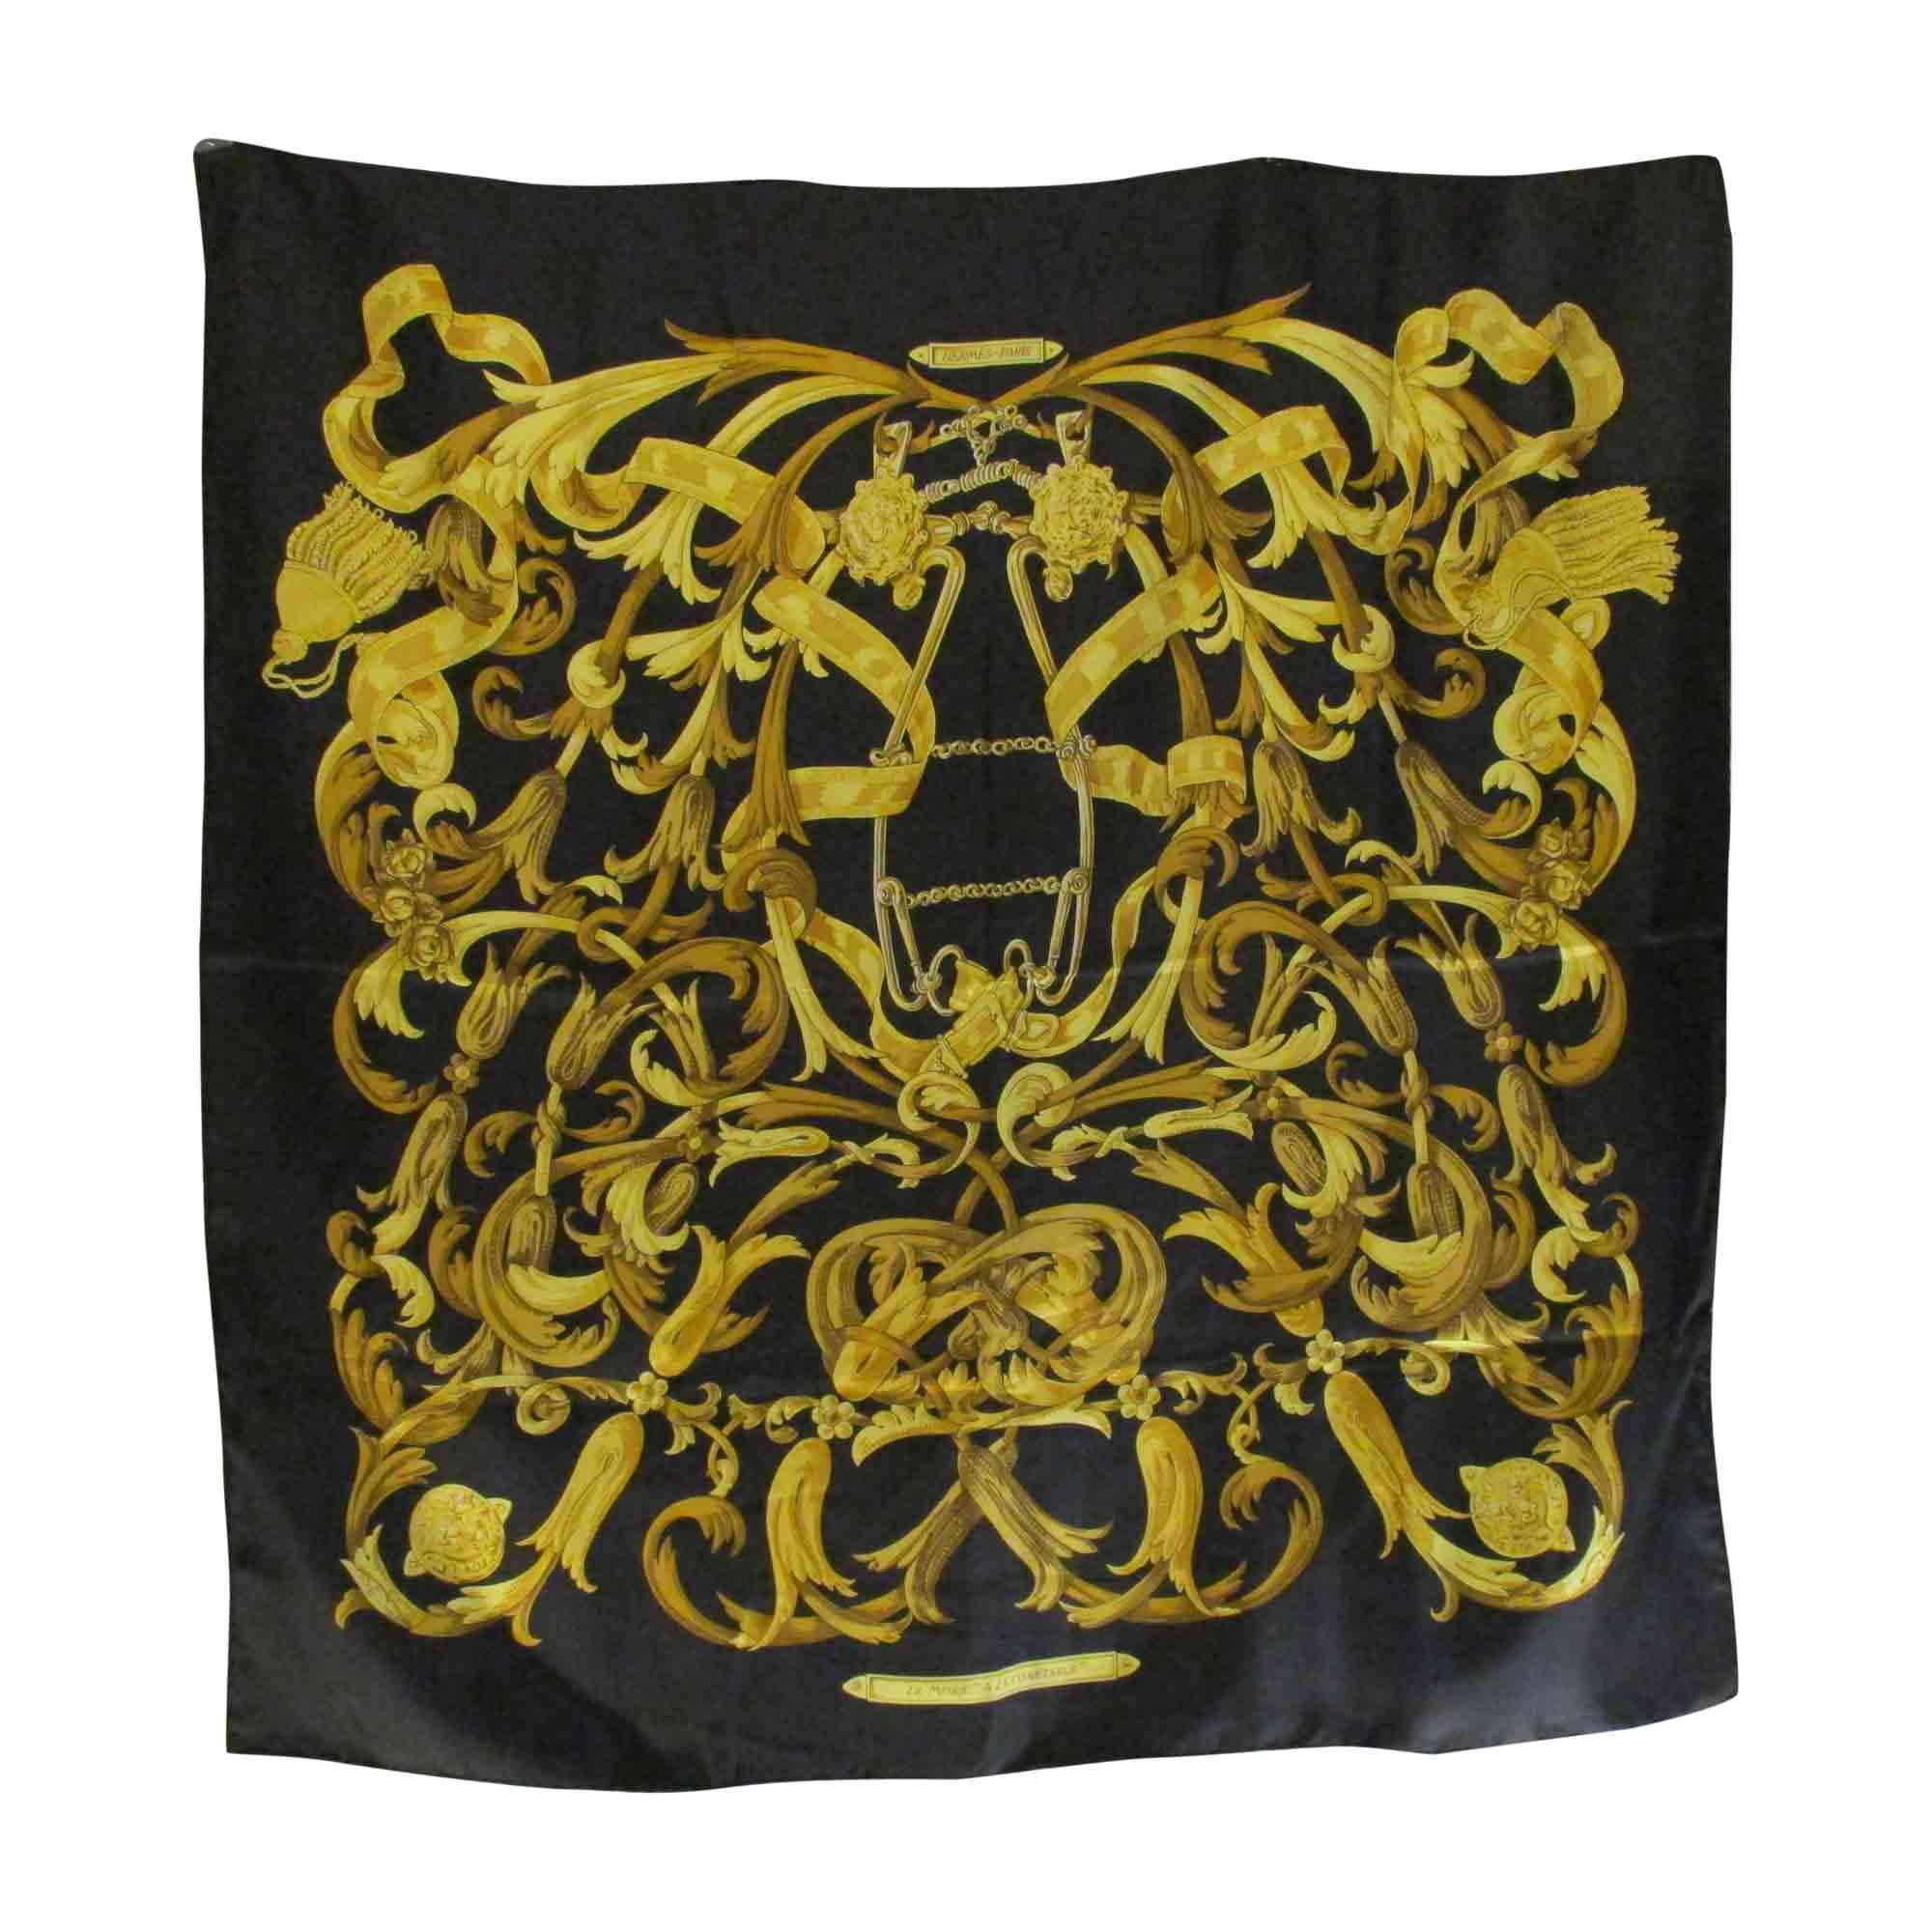 7b80adf657 Foulard HERMÈS carr dominante noir et jaune - 7039059